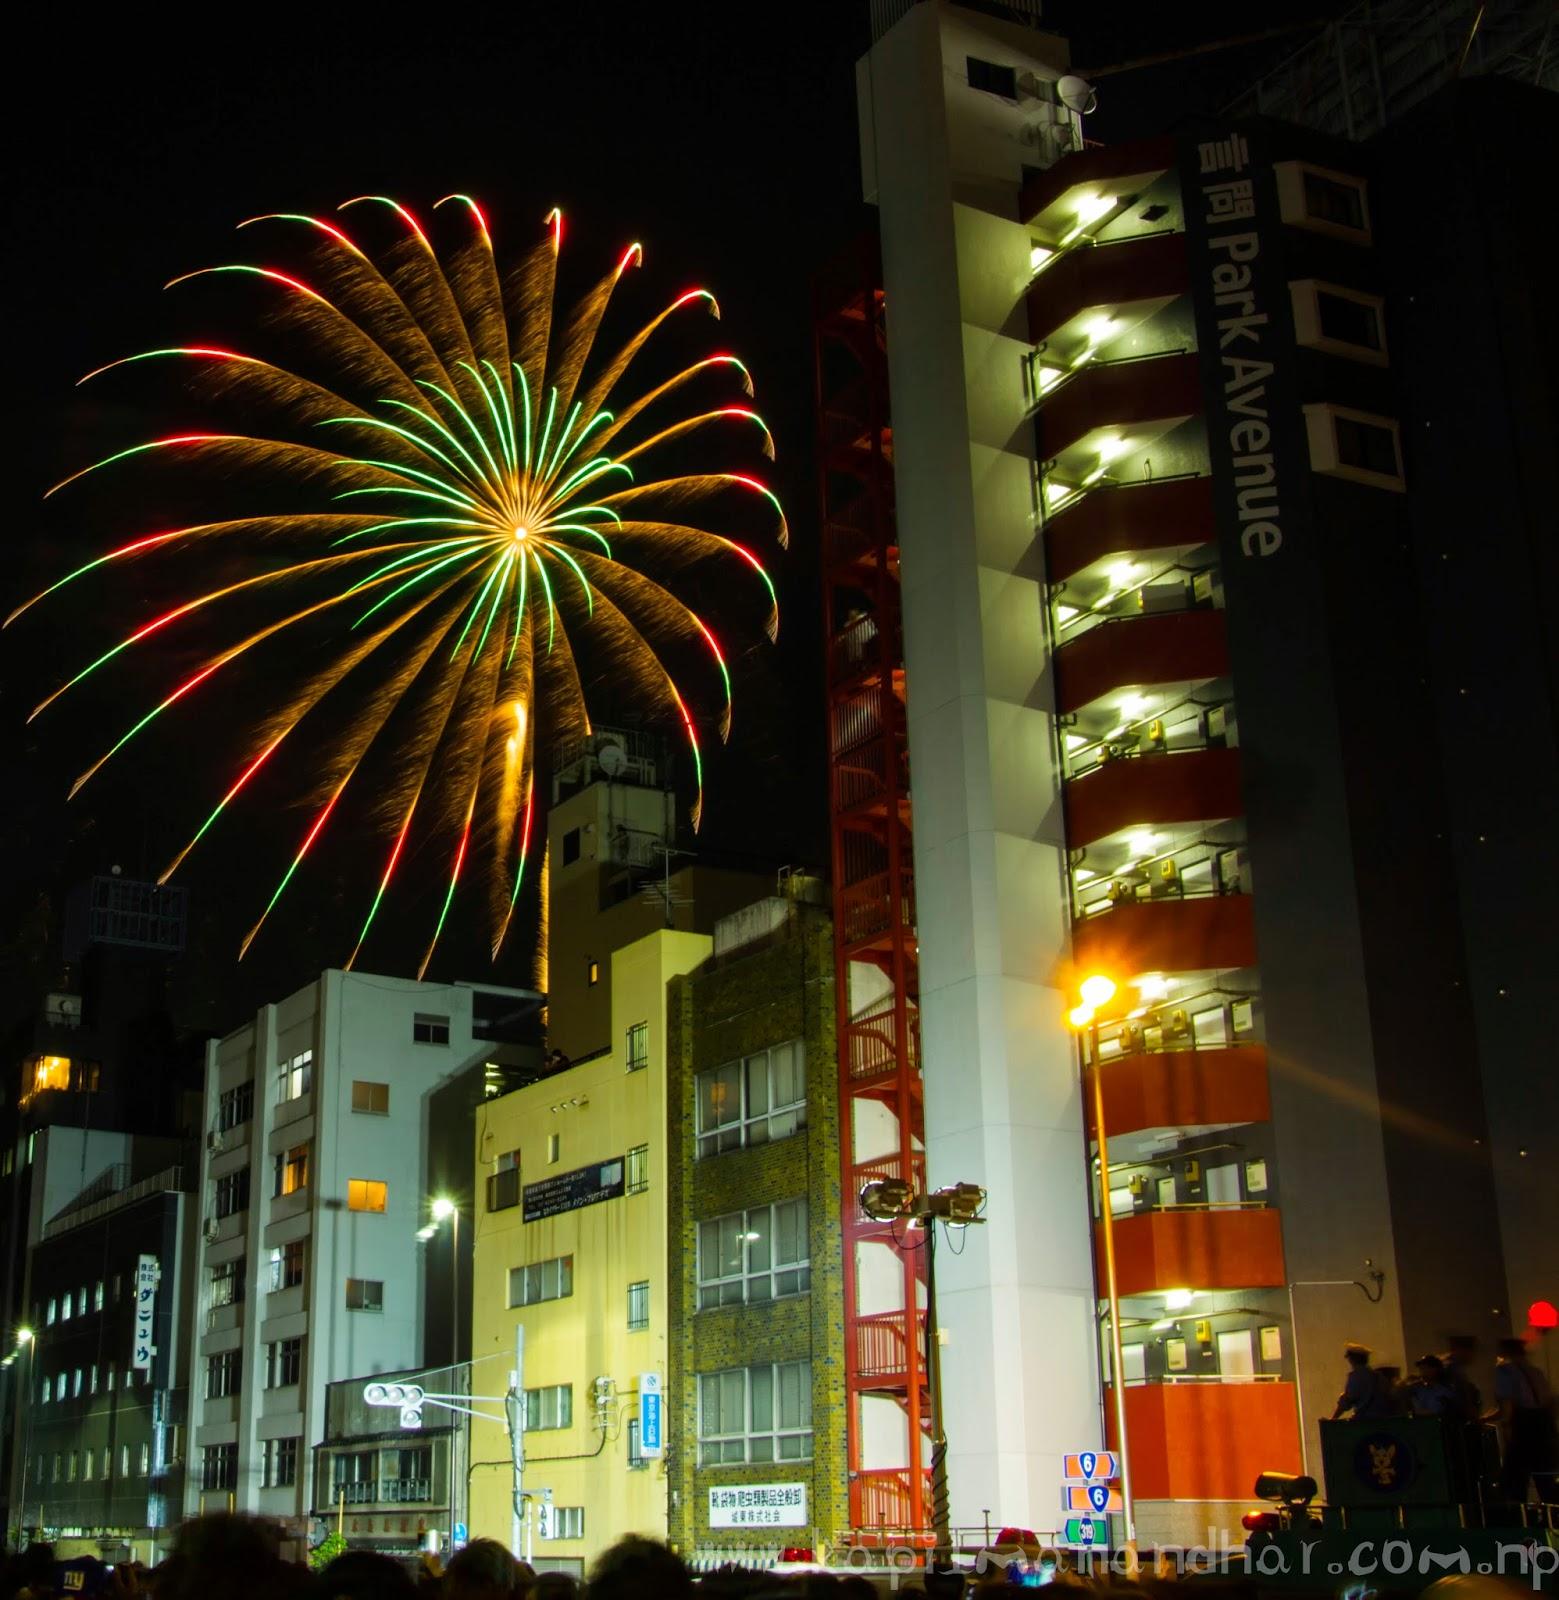 Fireworks Sumida River Tokyo 26th July, 2014 花火大会 2014年7月26日 東京 隅田川